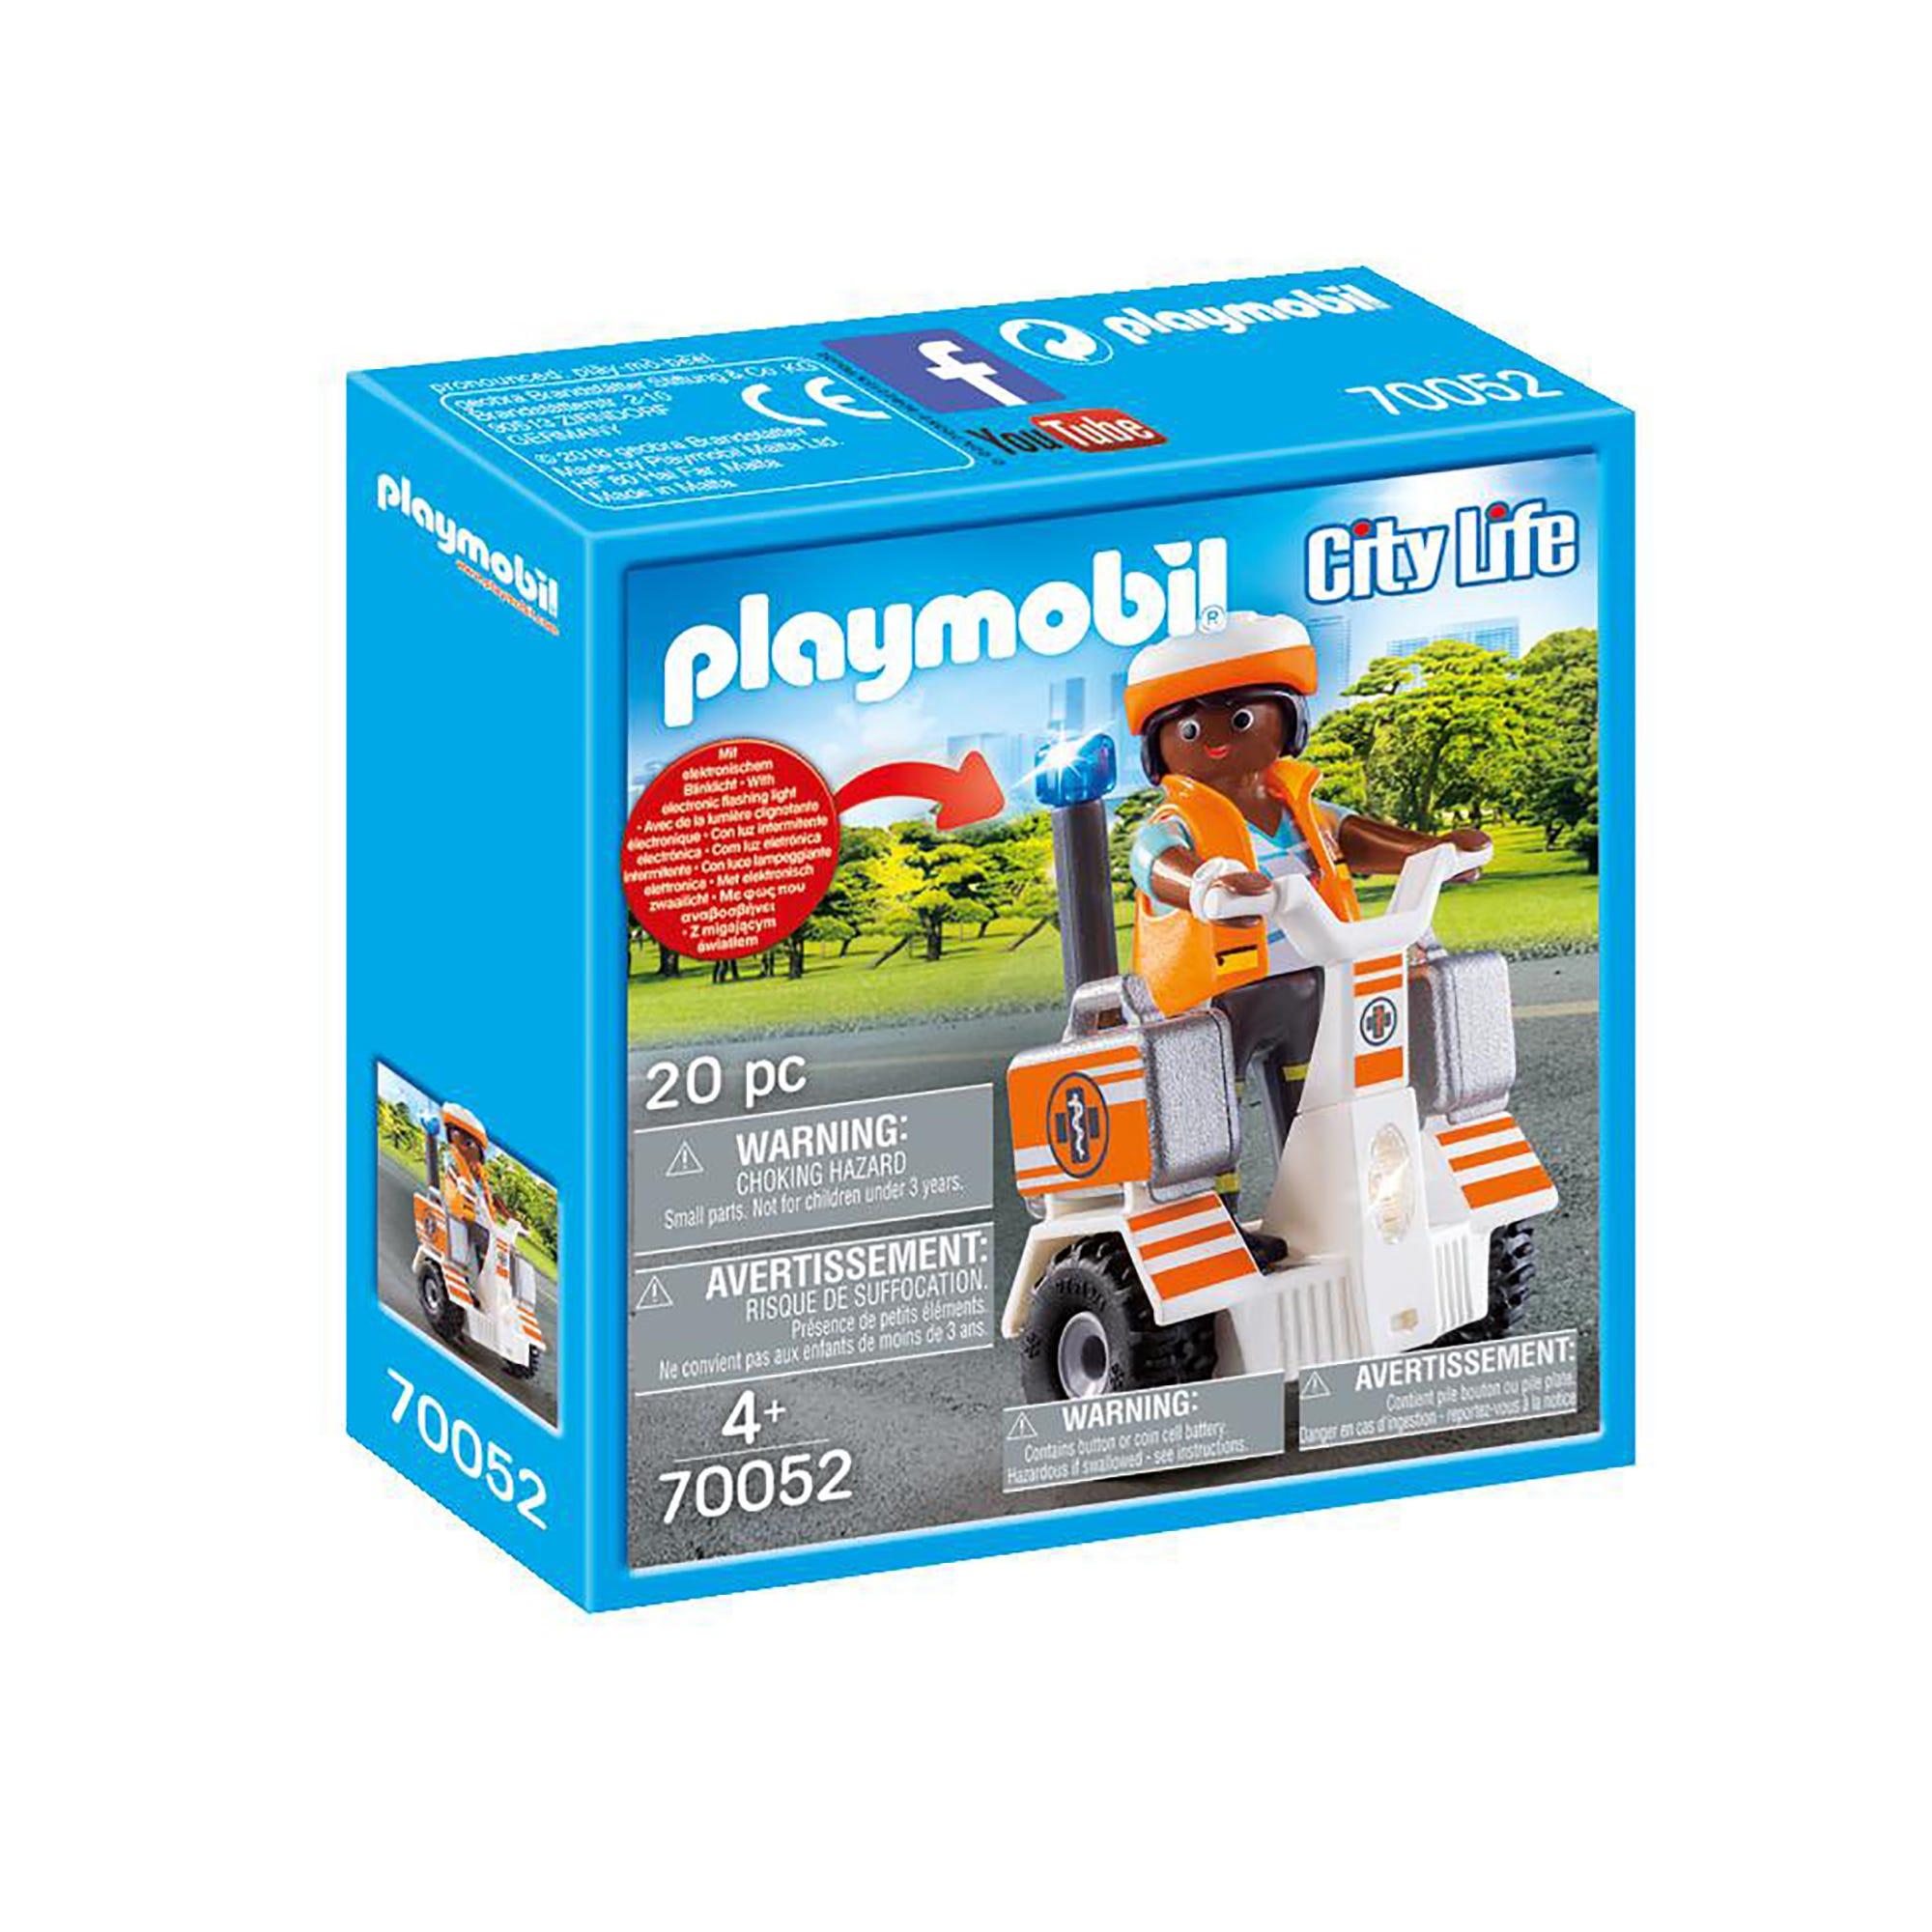 Playmobil 70052 City Life Rescue Balance Racer